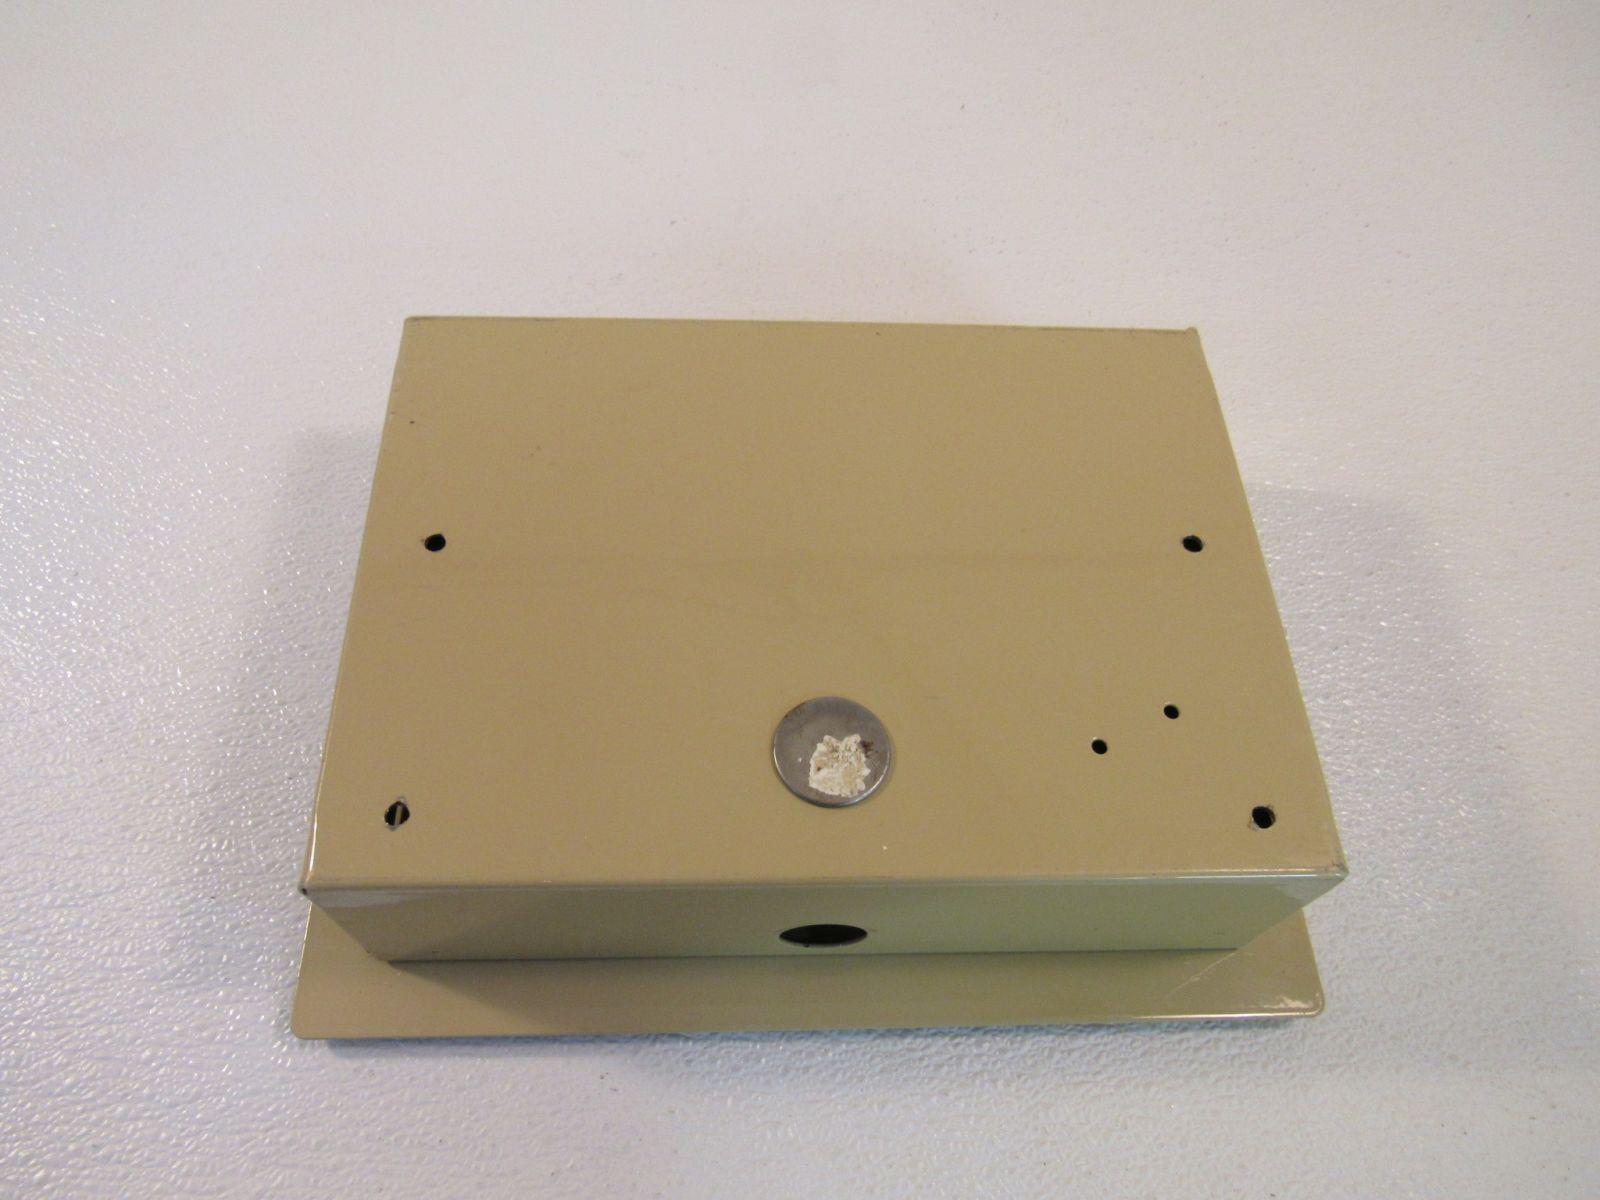 Generac Standby Power Monitor 20 Light A6733 Metal